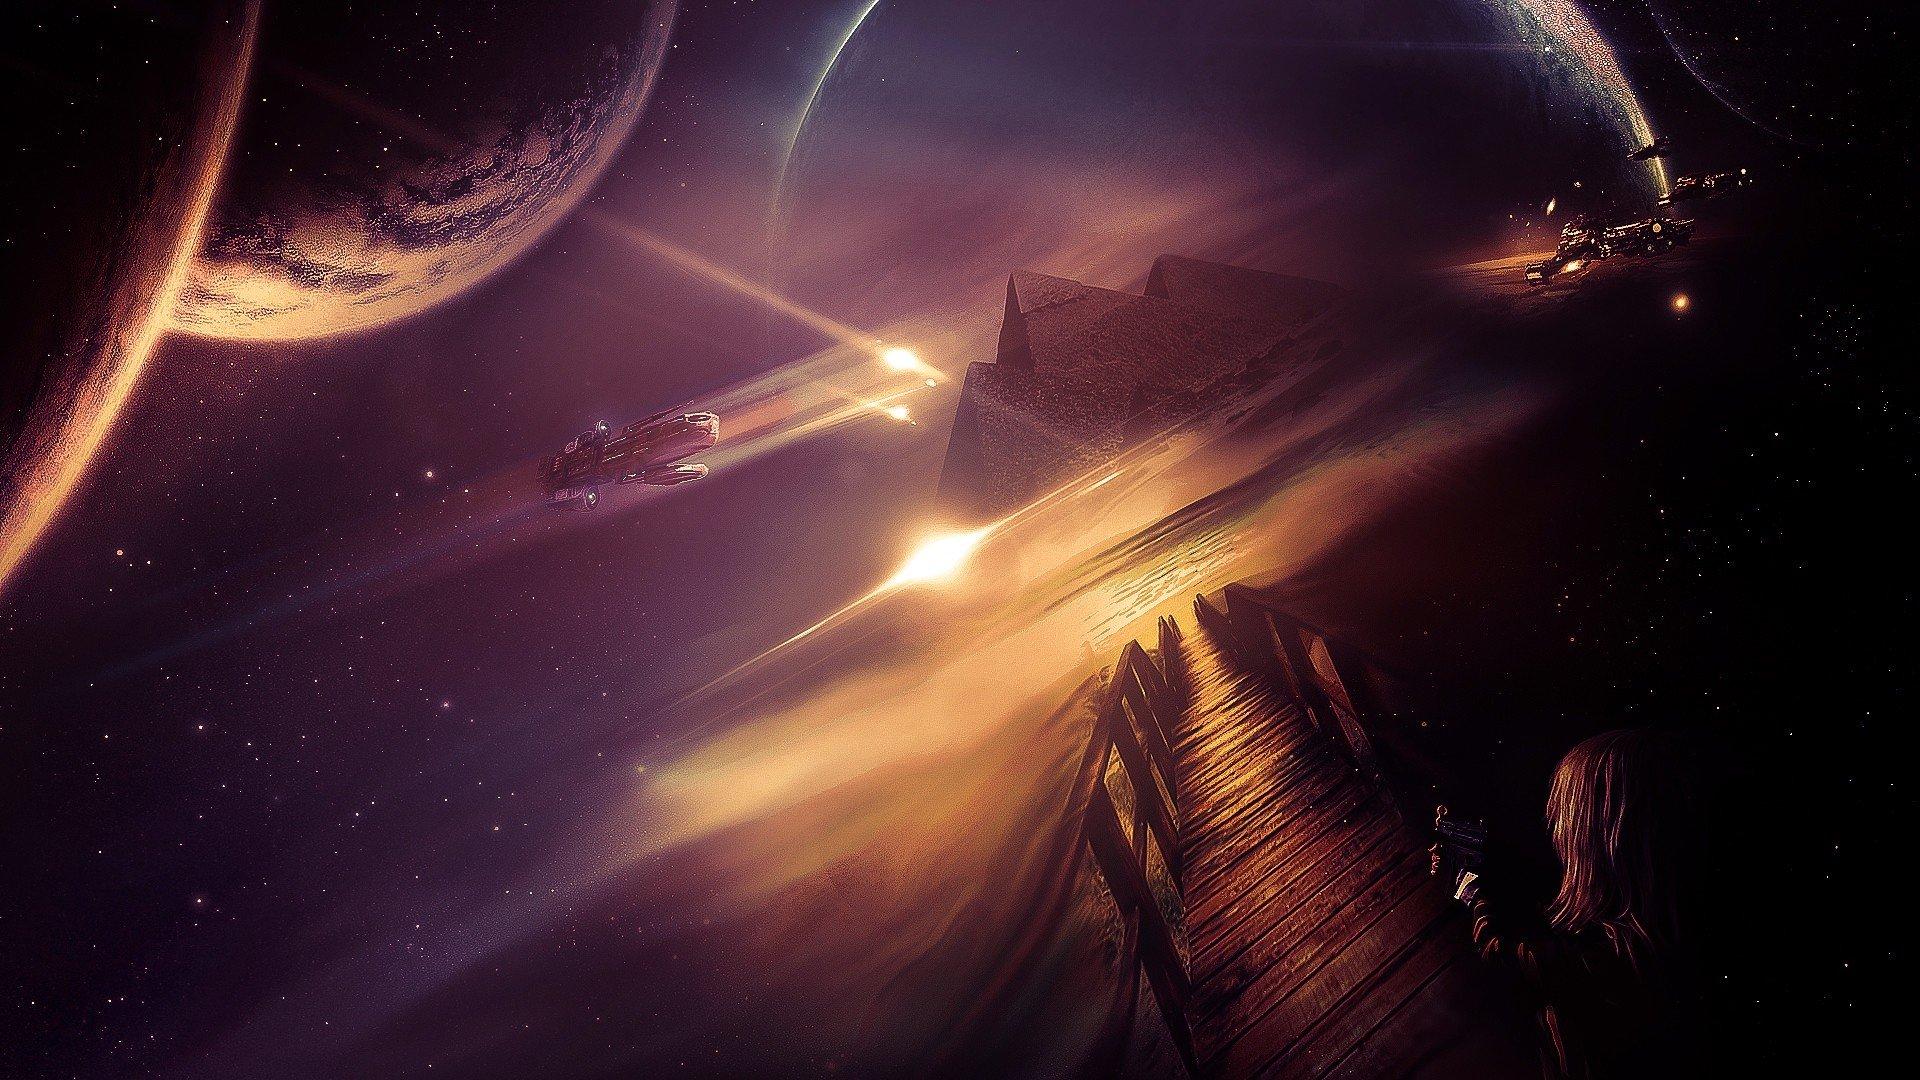 stars, Space, Planet, Galaxy Wallpaper